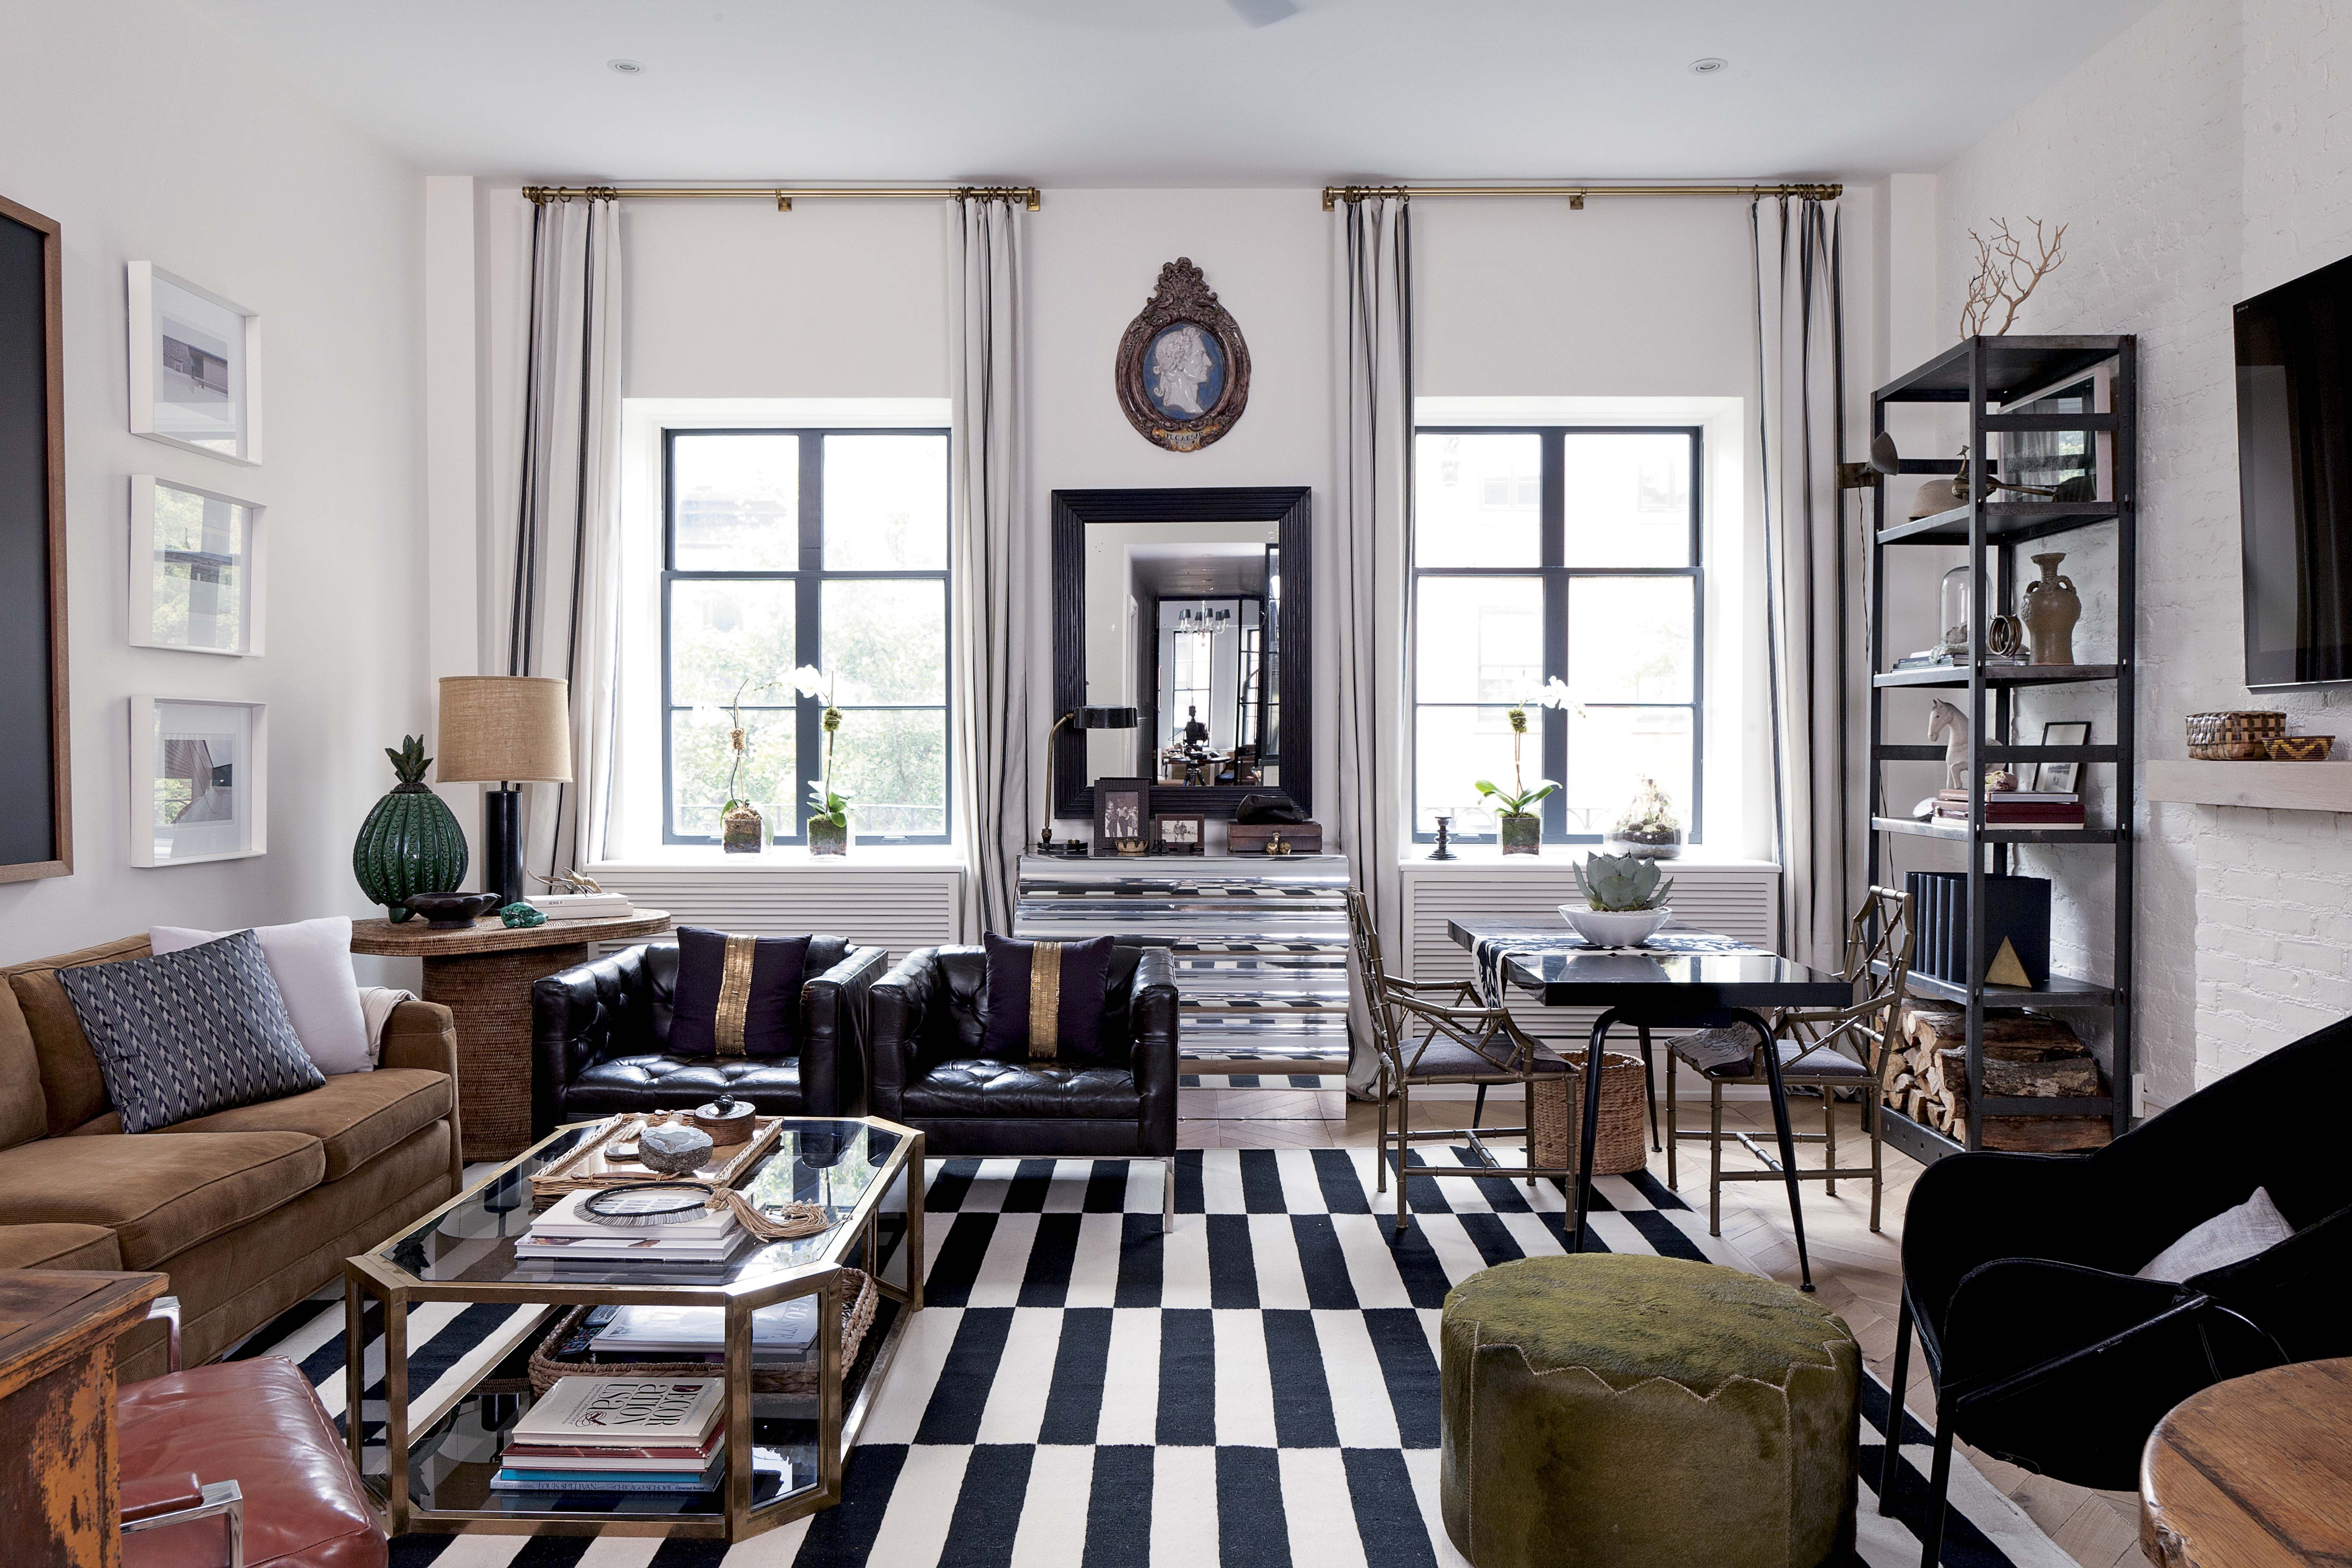 5 rules of design from Nate Berkus My Interior Design Styles